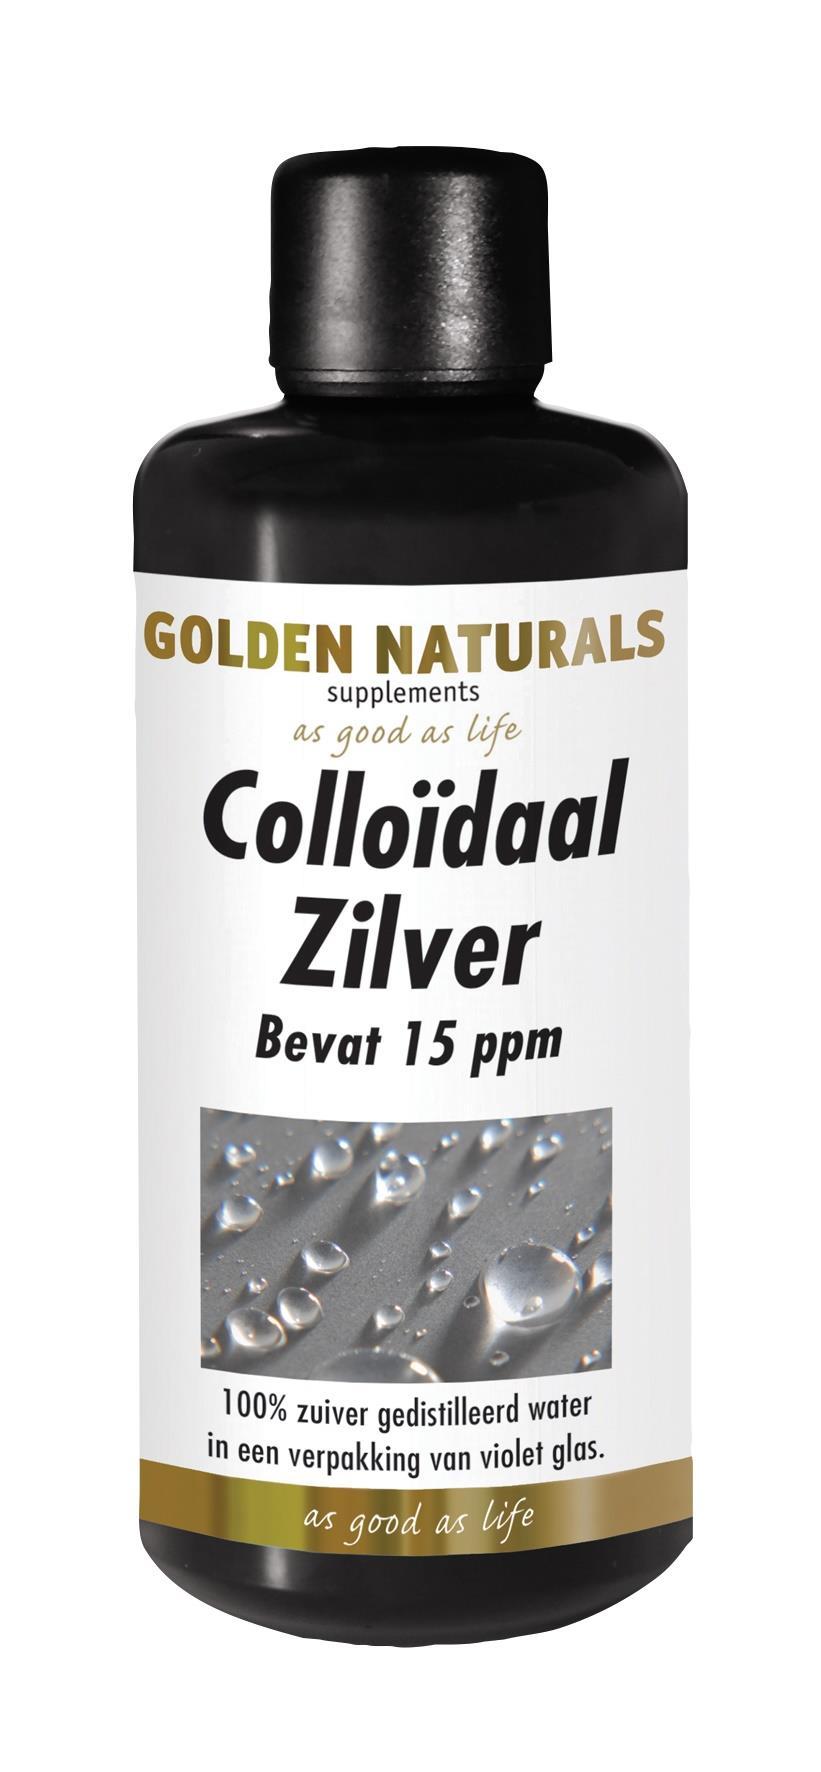 Golden Naturals Colloïdaal Zilver (100 milliliter)